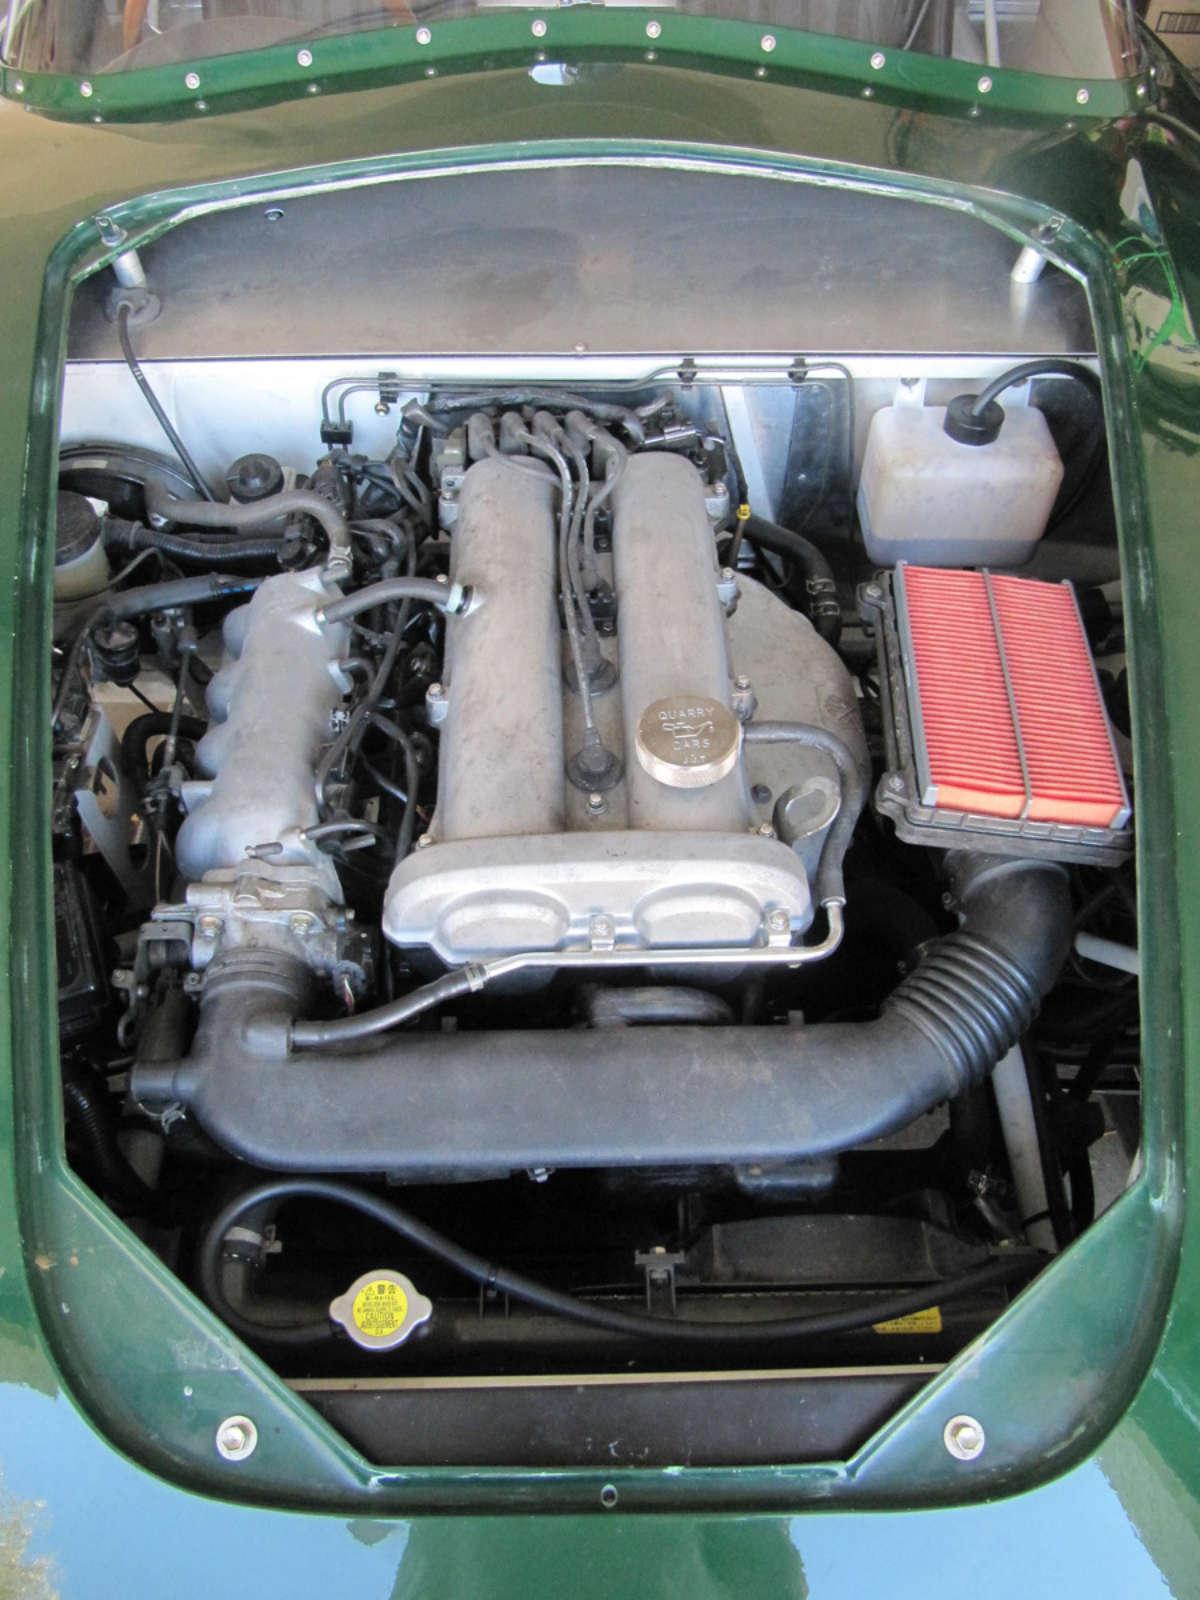 Miata-Based Aston Martin Replica   ReinCarNation Magazine